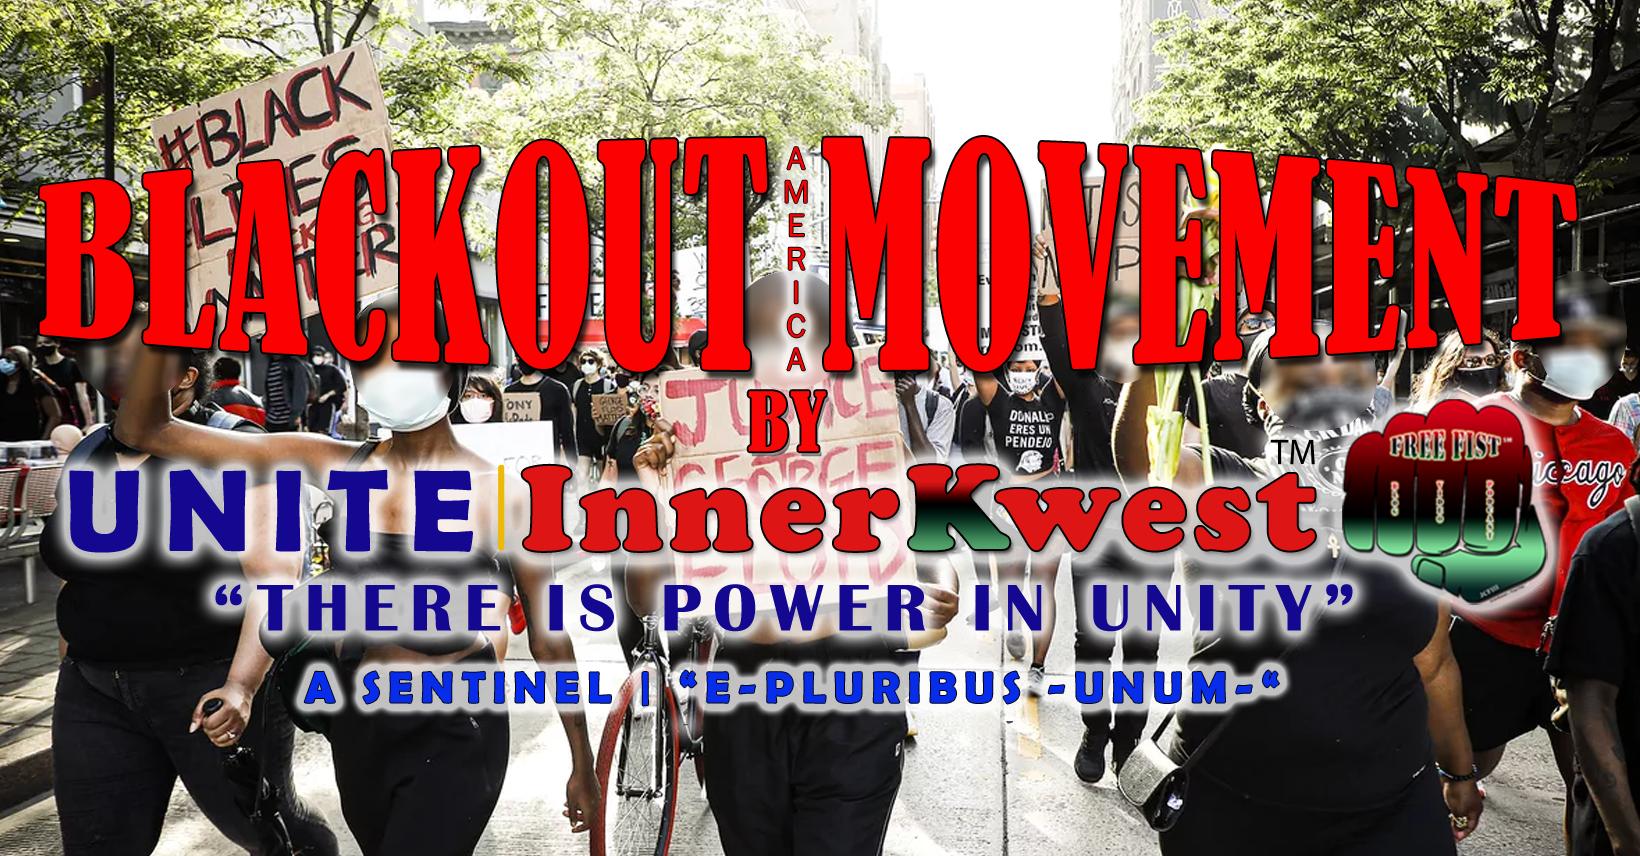 BlackOut America Movement